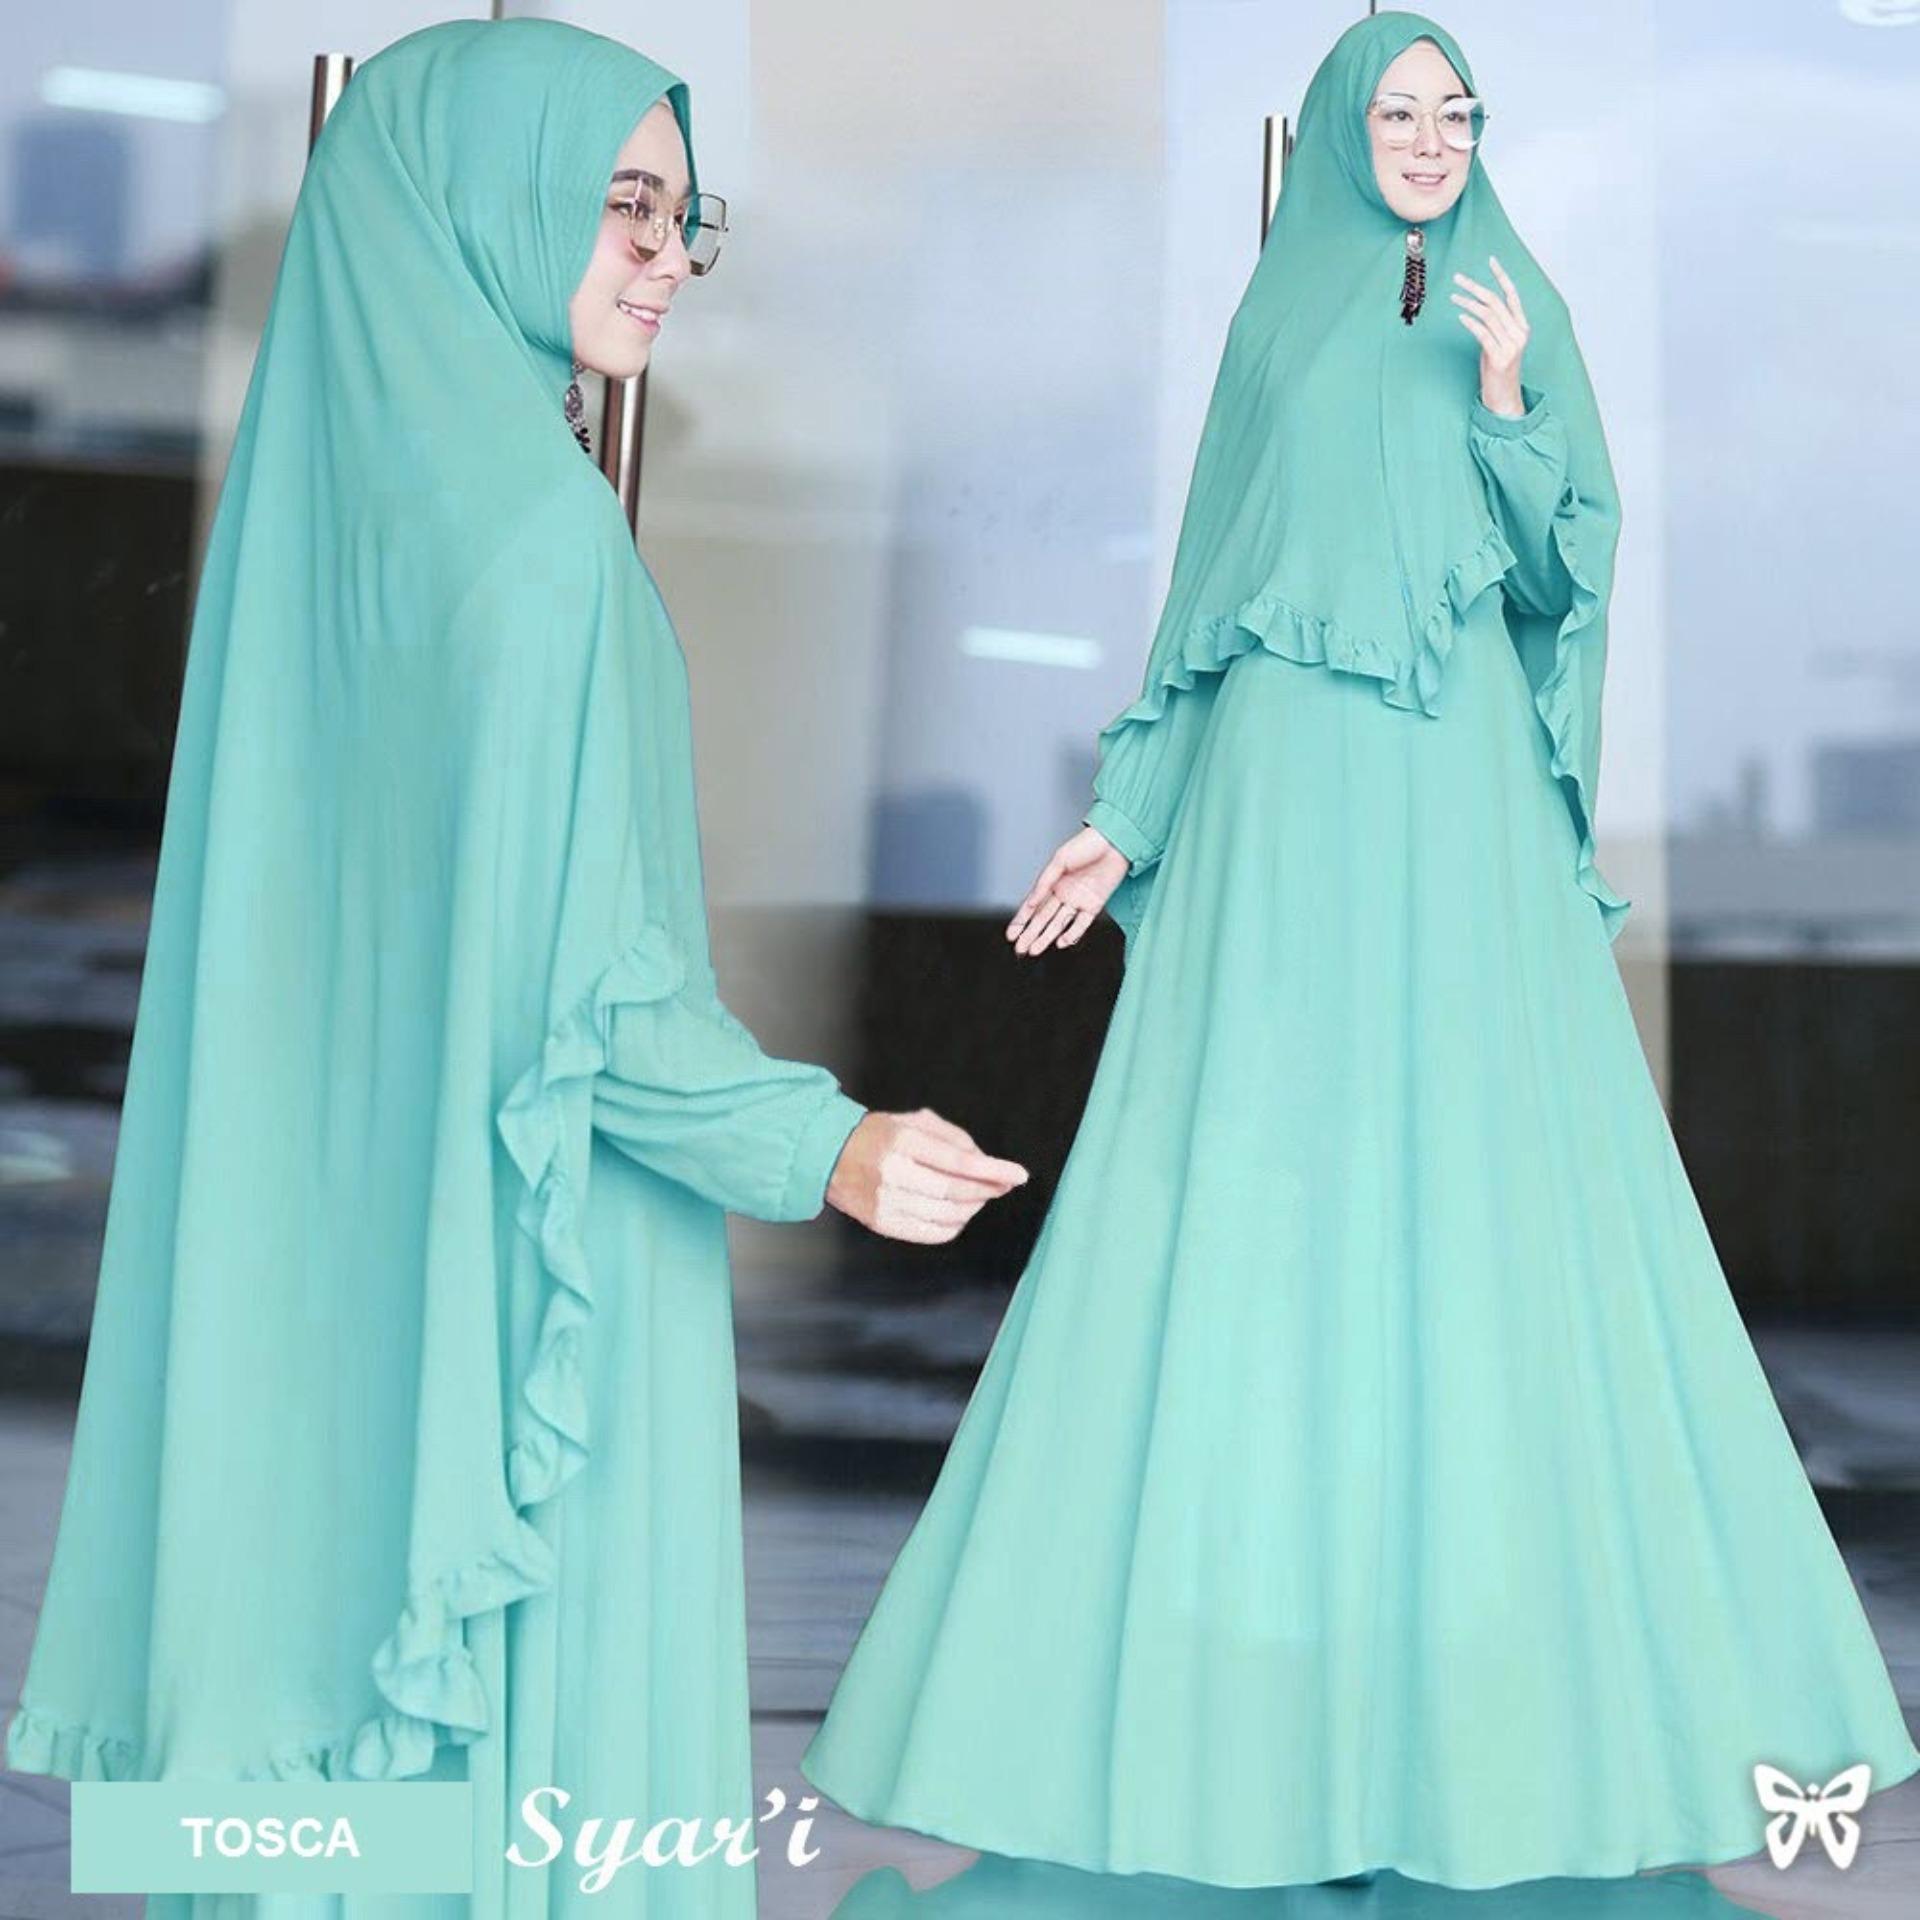 Flavia Store Gamis Syari Set 2 in 1 FS0719 - TOSCA / Baju Muslim Wanita Syar'i / Gaun Muslimah / Maxi Dress Lengan Panjang / Hijab Polos / Srjuanita